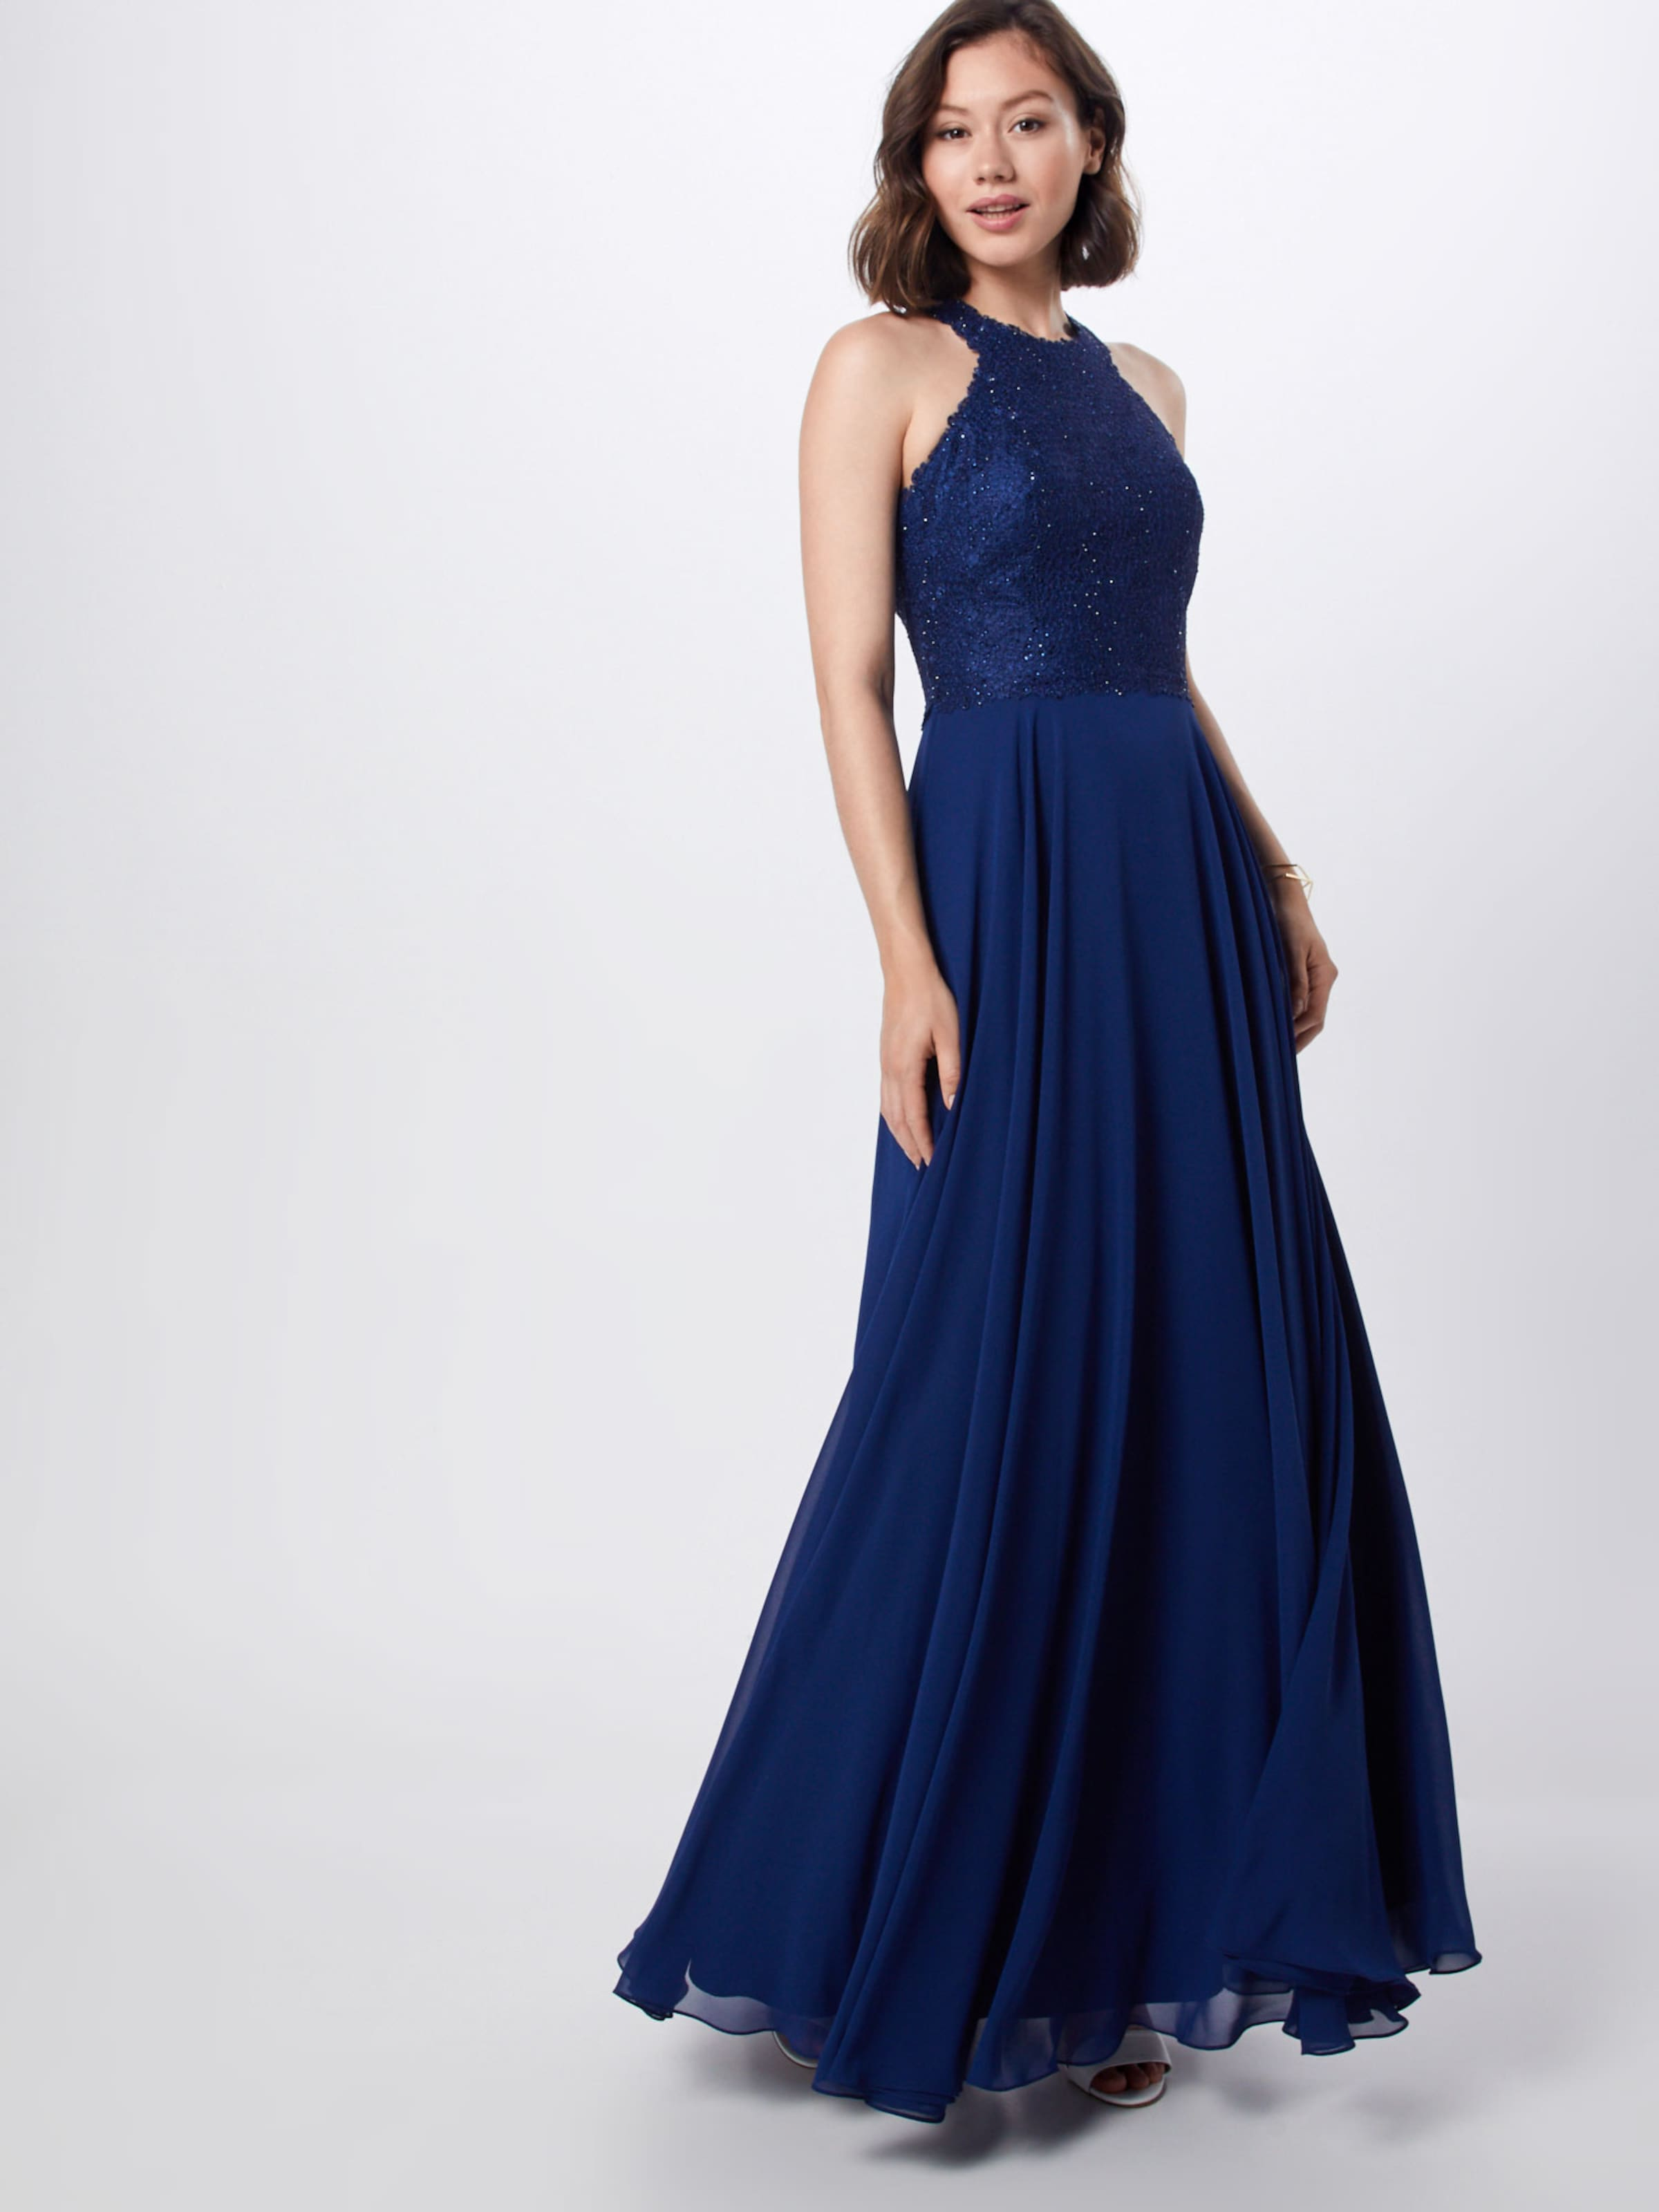 Nuit En Bleu De Luxuar Soirée Robe KJ3FcT1ul